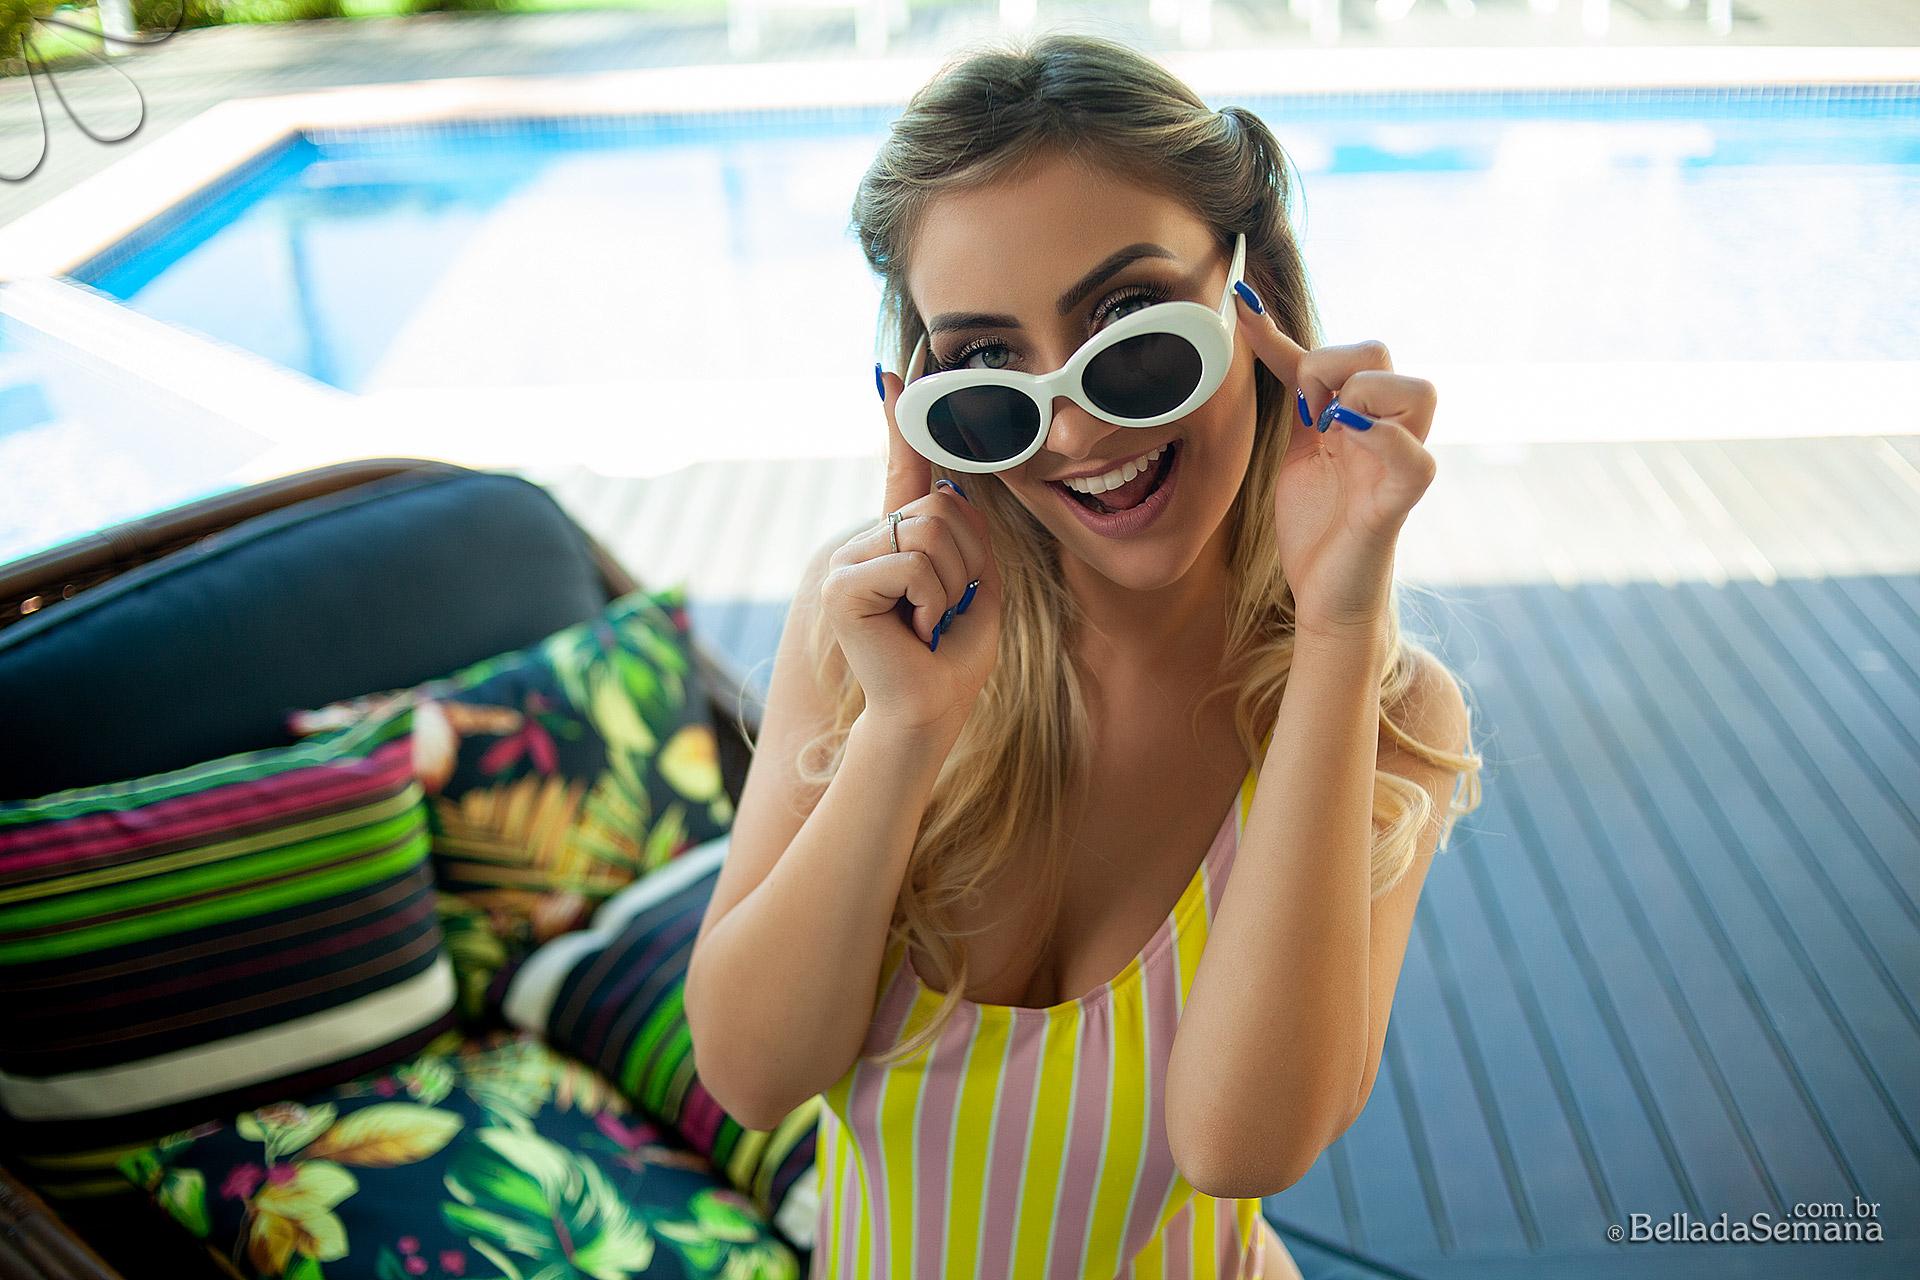 Jaíne Cristina #2 | Bella da Semana